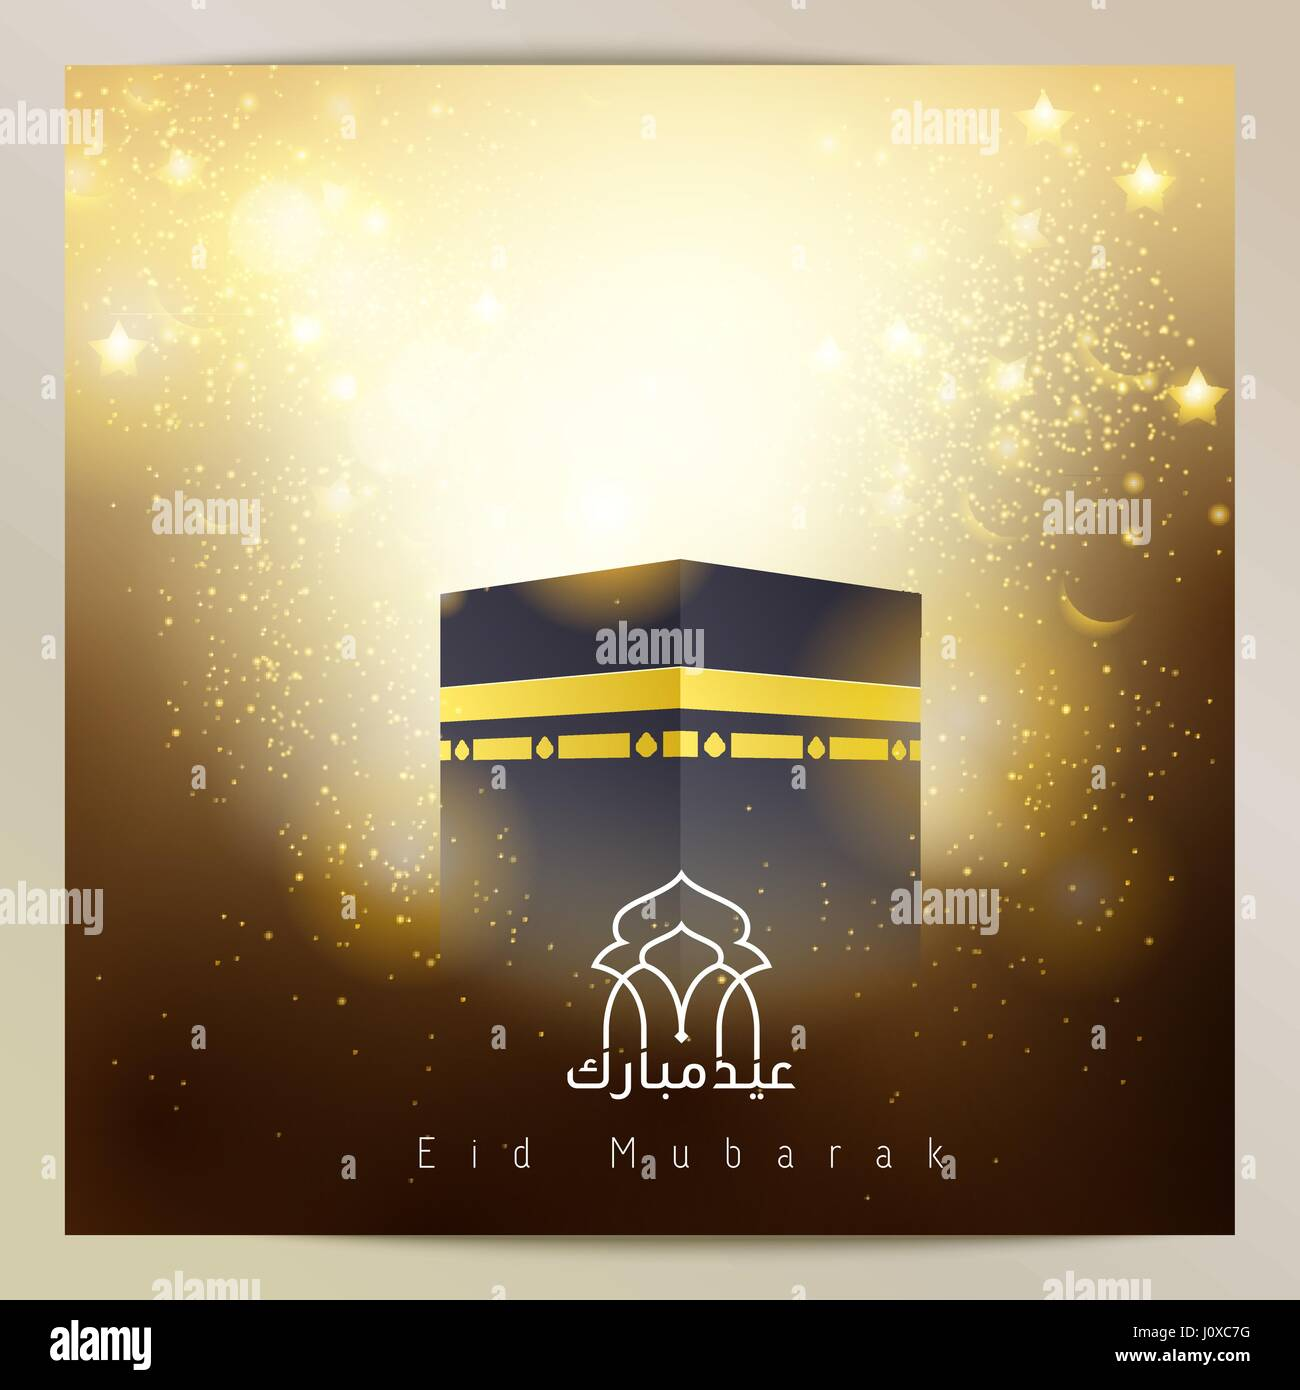 Kaaba Eid Adha Mubarak For Hajj Greeting Stock Vector Image Art Alamy